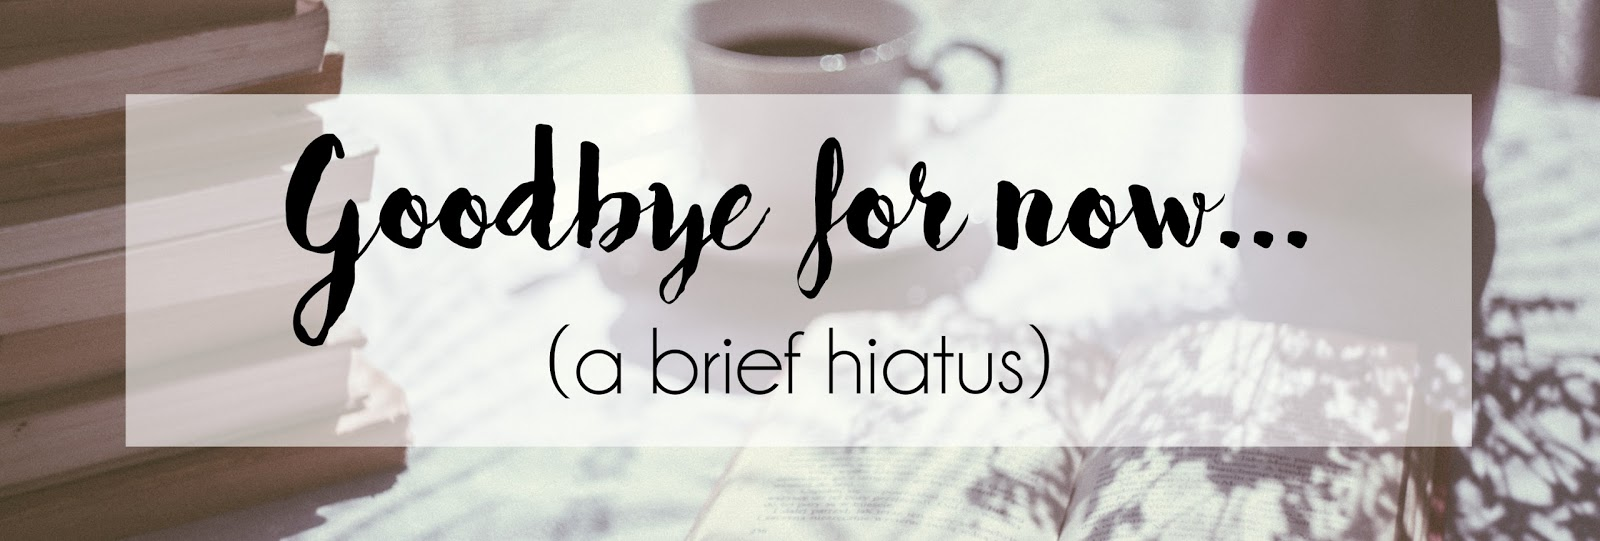 We're going on hiatus | Cornerfolds